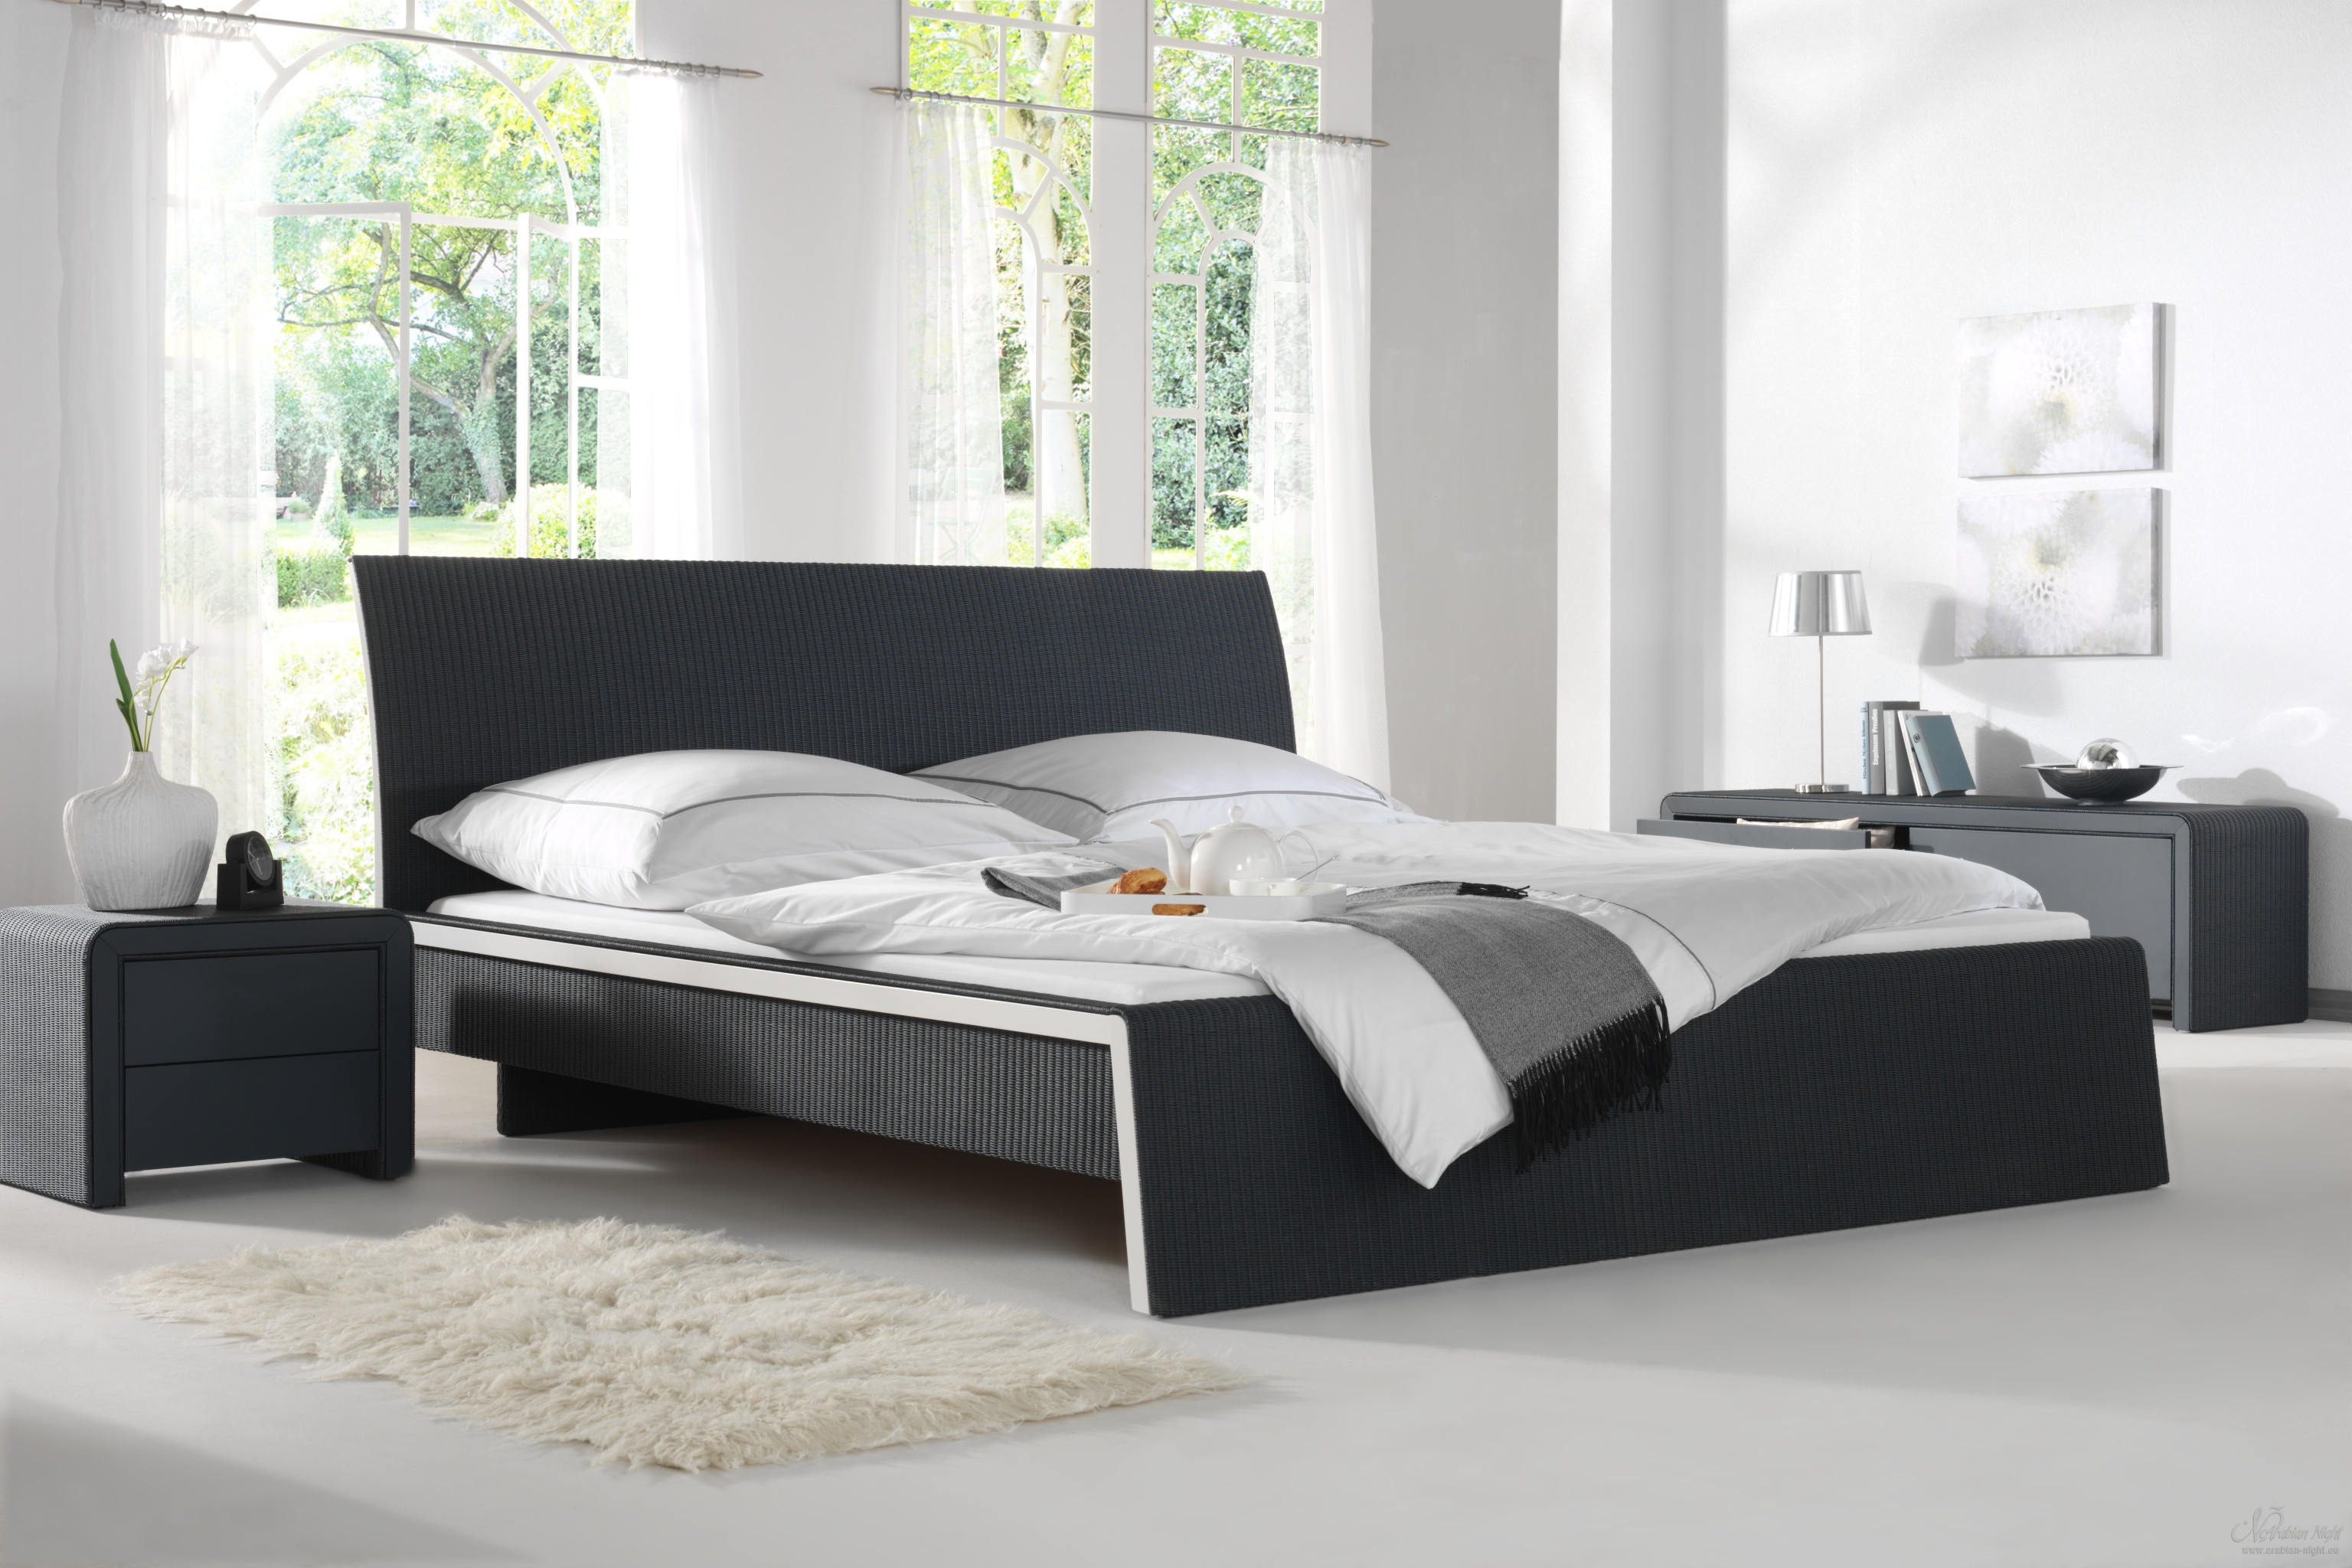 loombett model neo rattan korbhaus. Black Bedroom Furniture Sets. Home Design Ideas